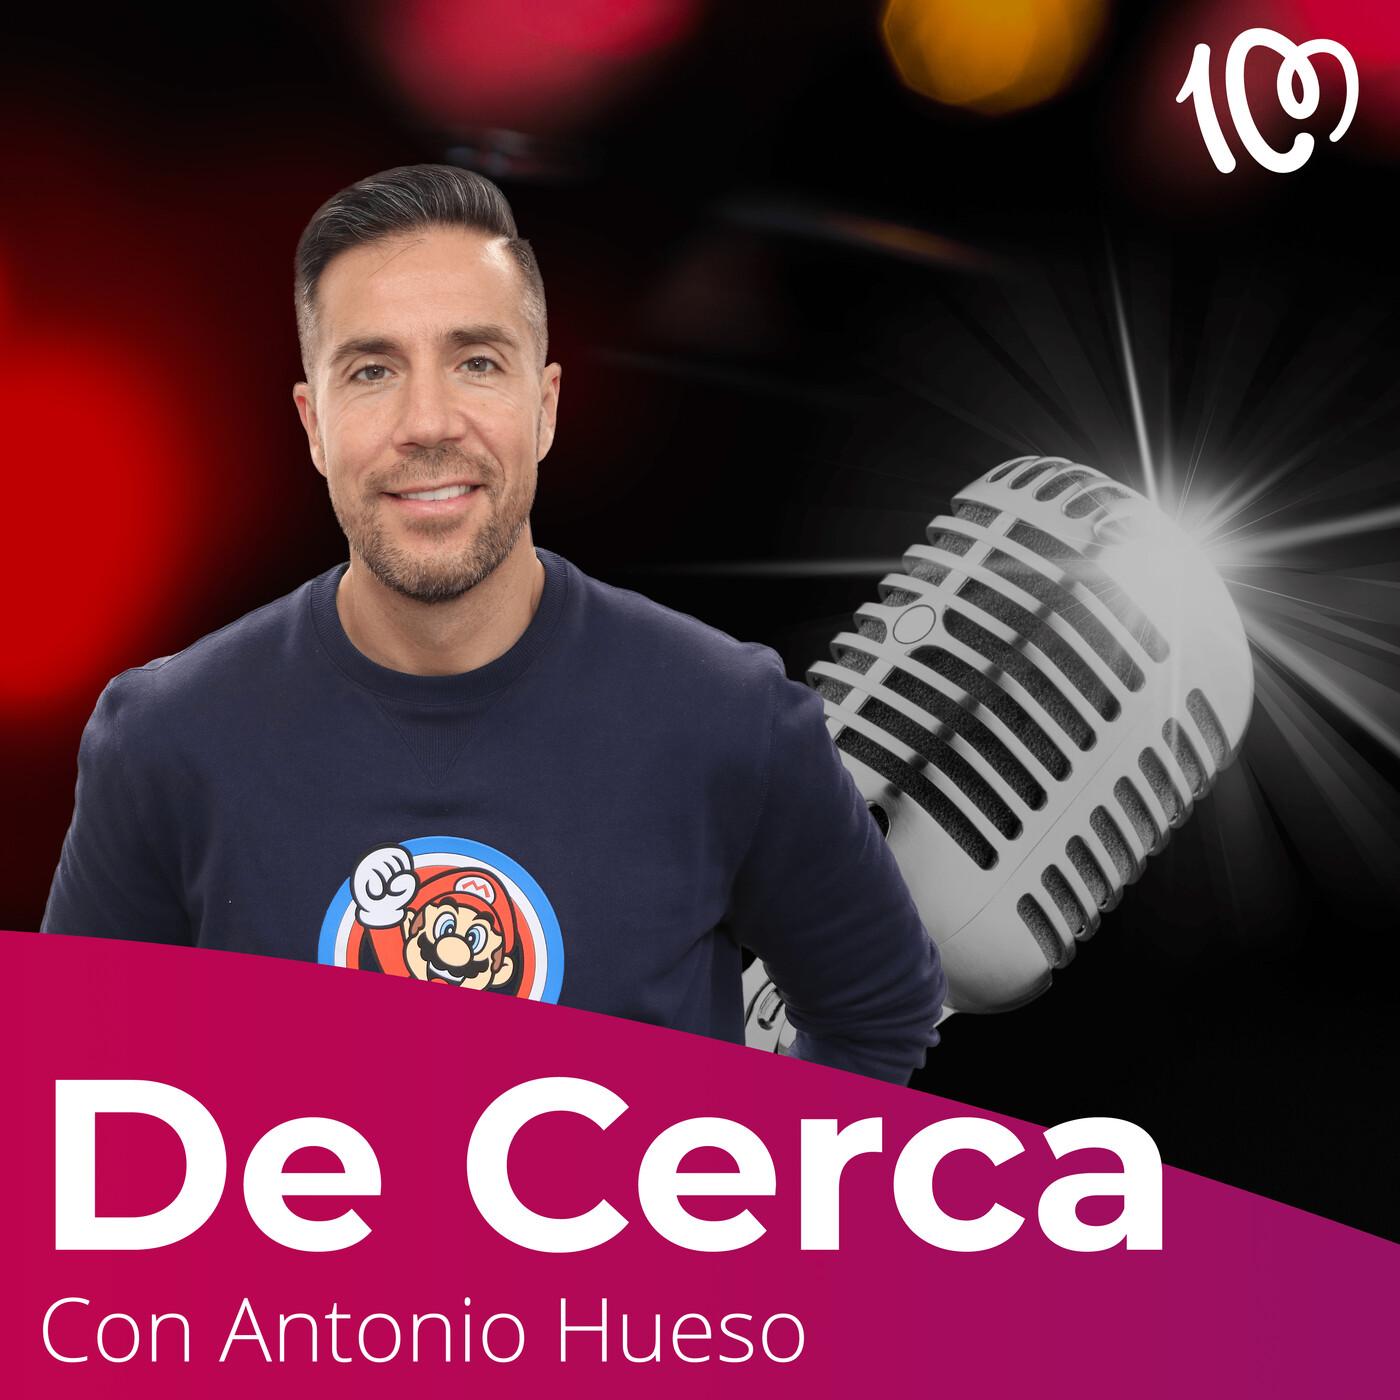 Antonio Hueso de cerca